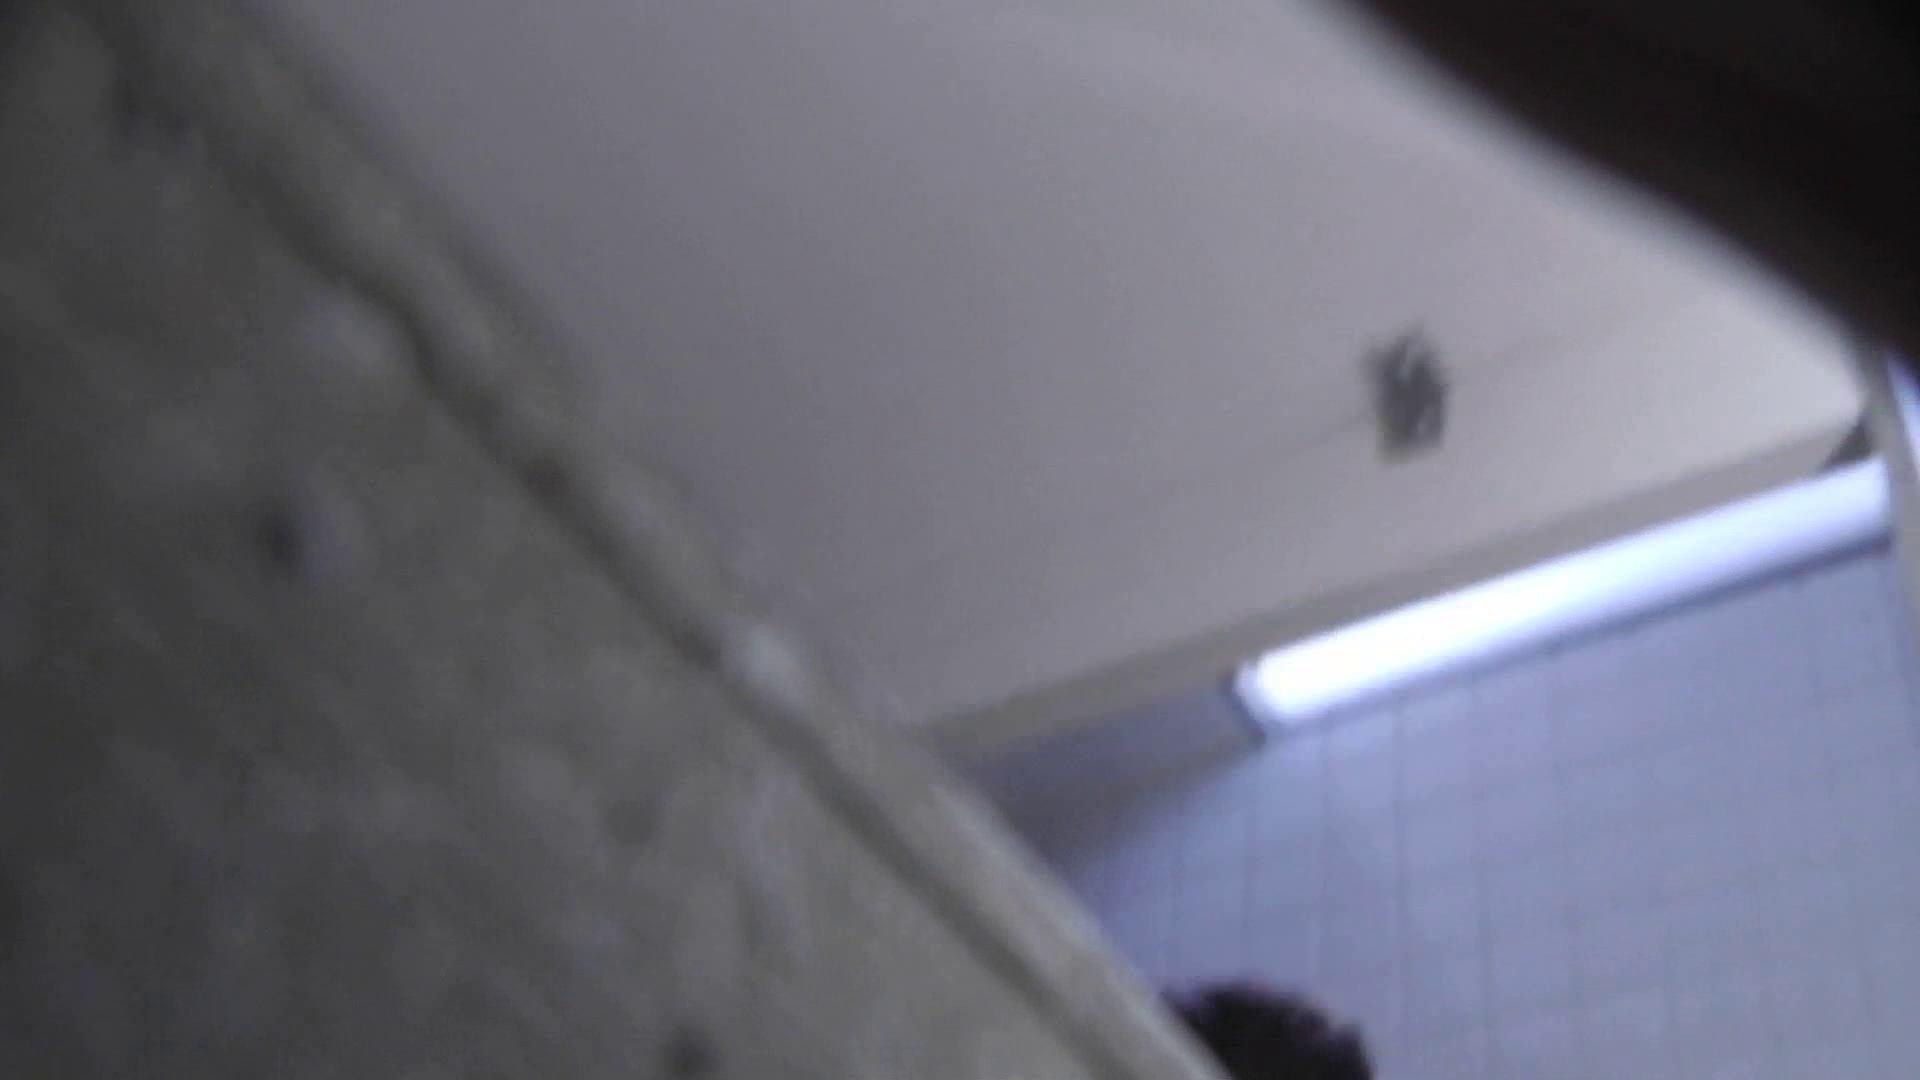 vol.06 命がけ潜伏洗面所! 茶髪タン、ハァハァ 前編 プライベート   洗面所編  76PIX 73